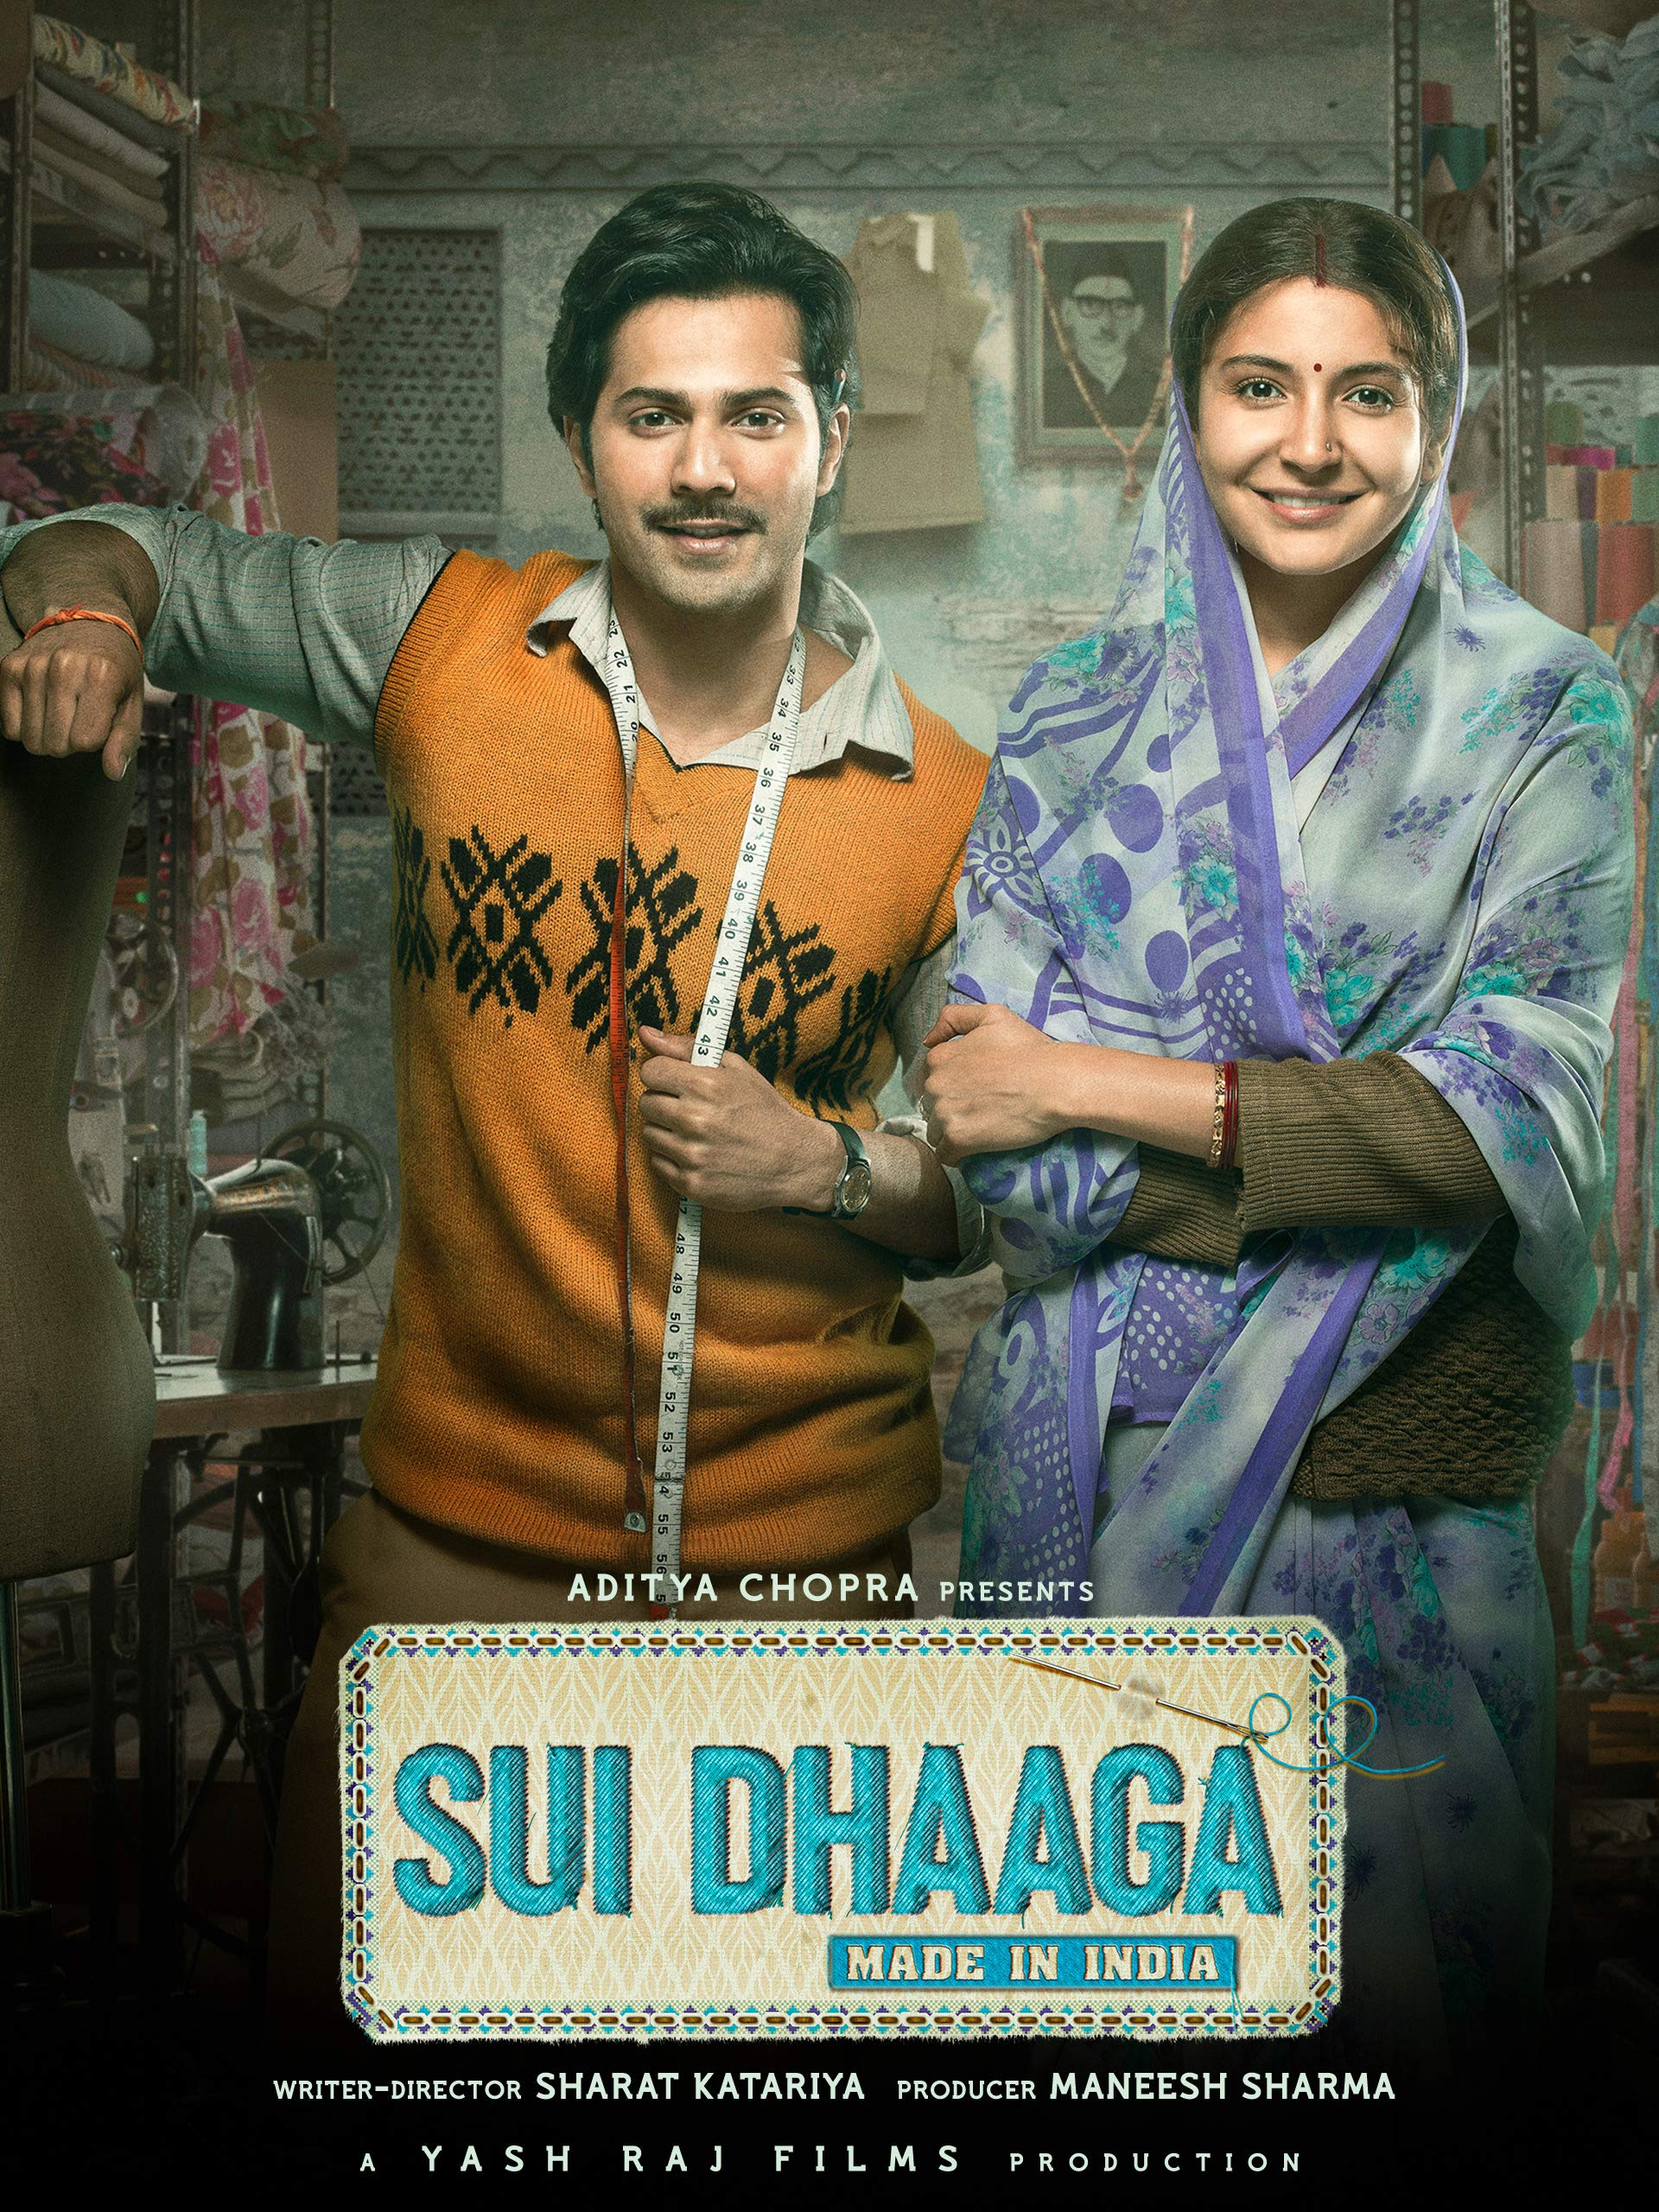 Sui Dhaaga - Made In India (4K UHD)